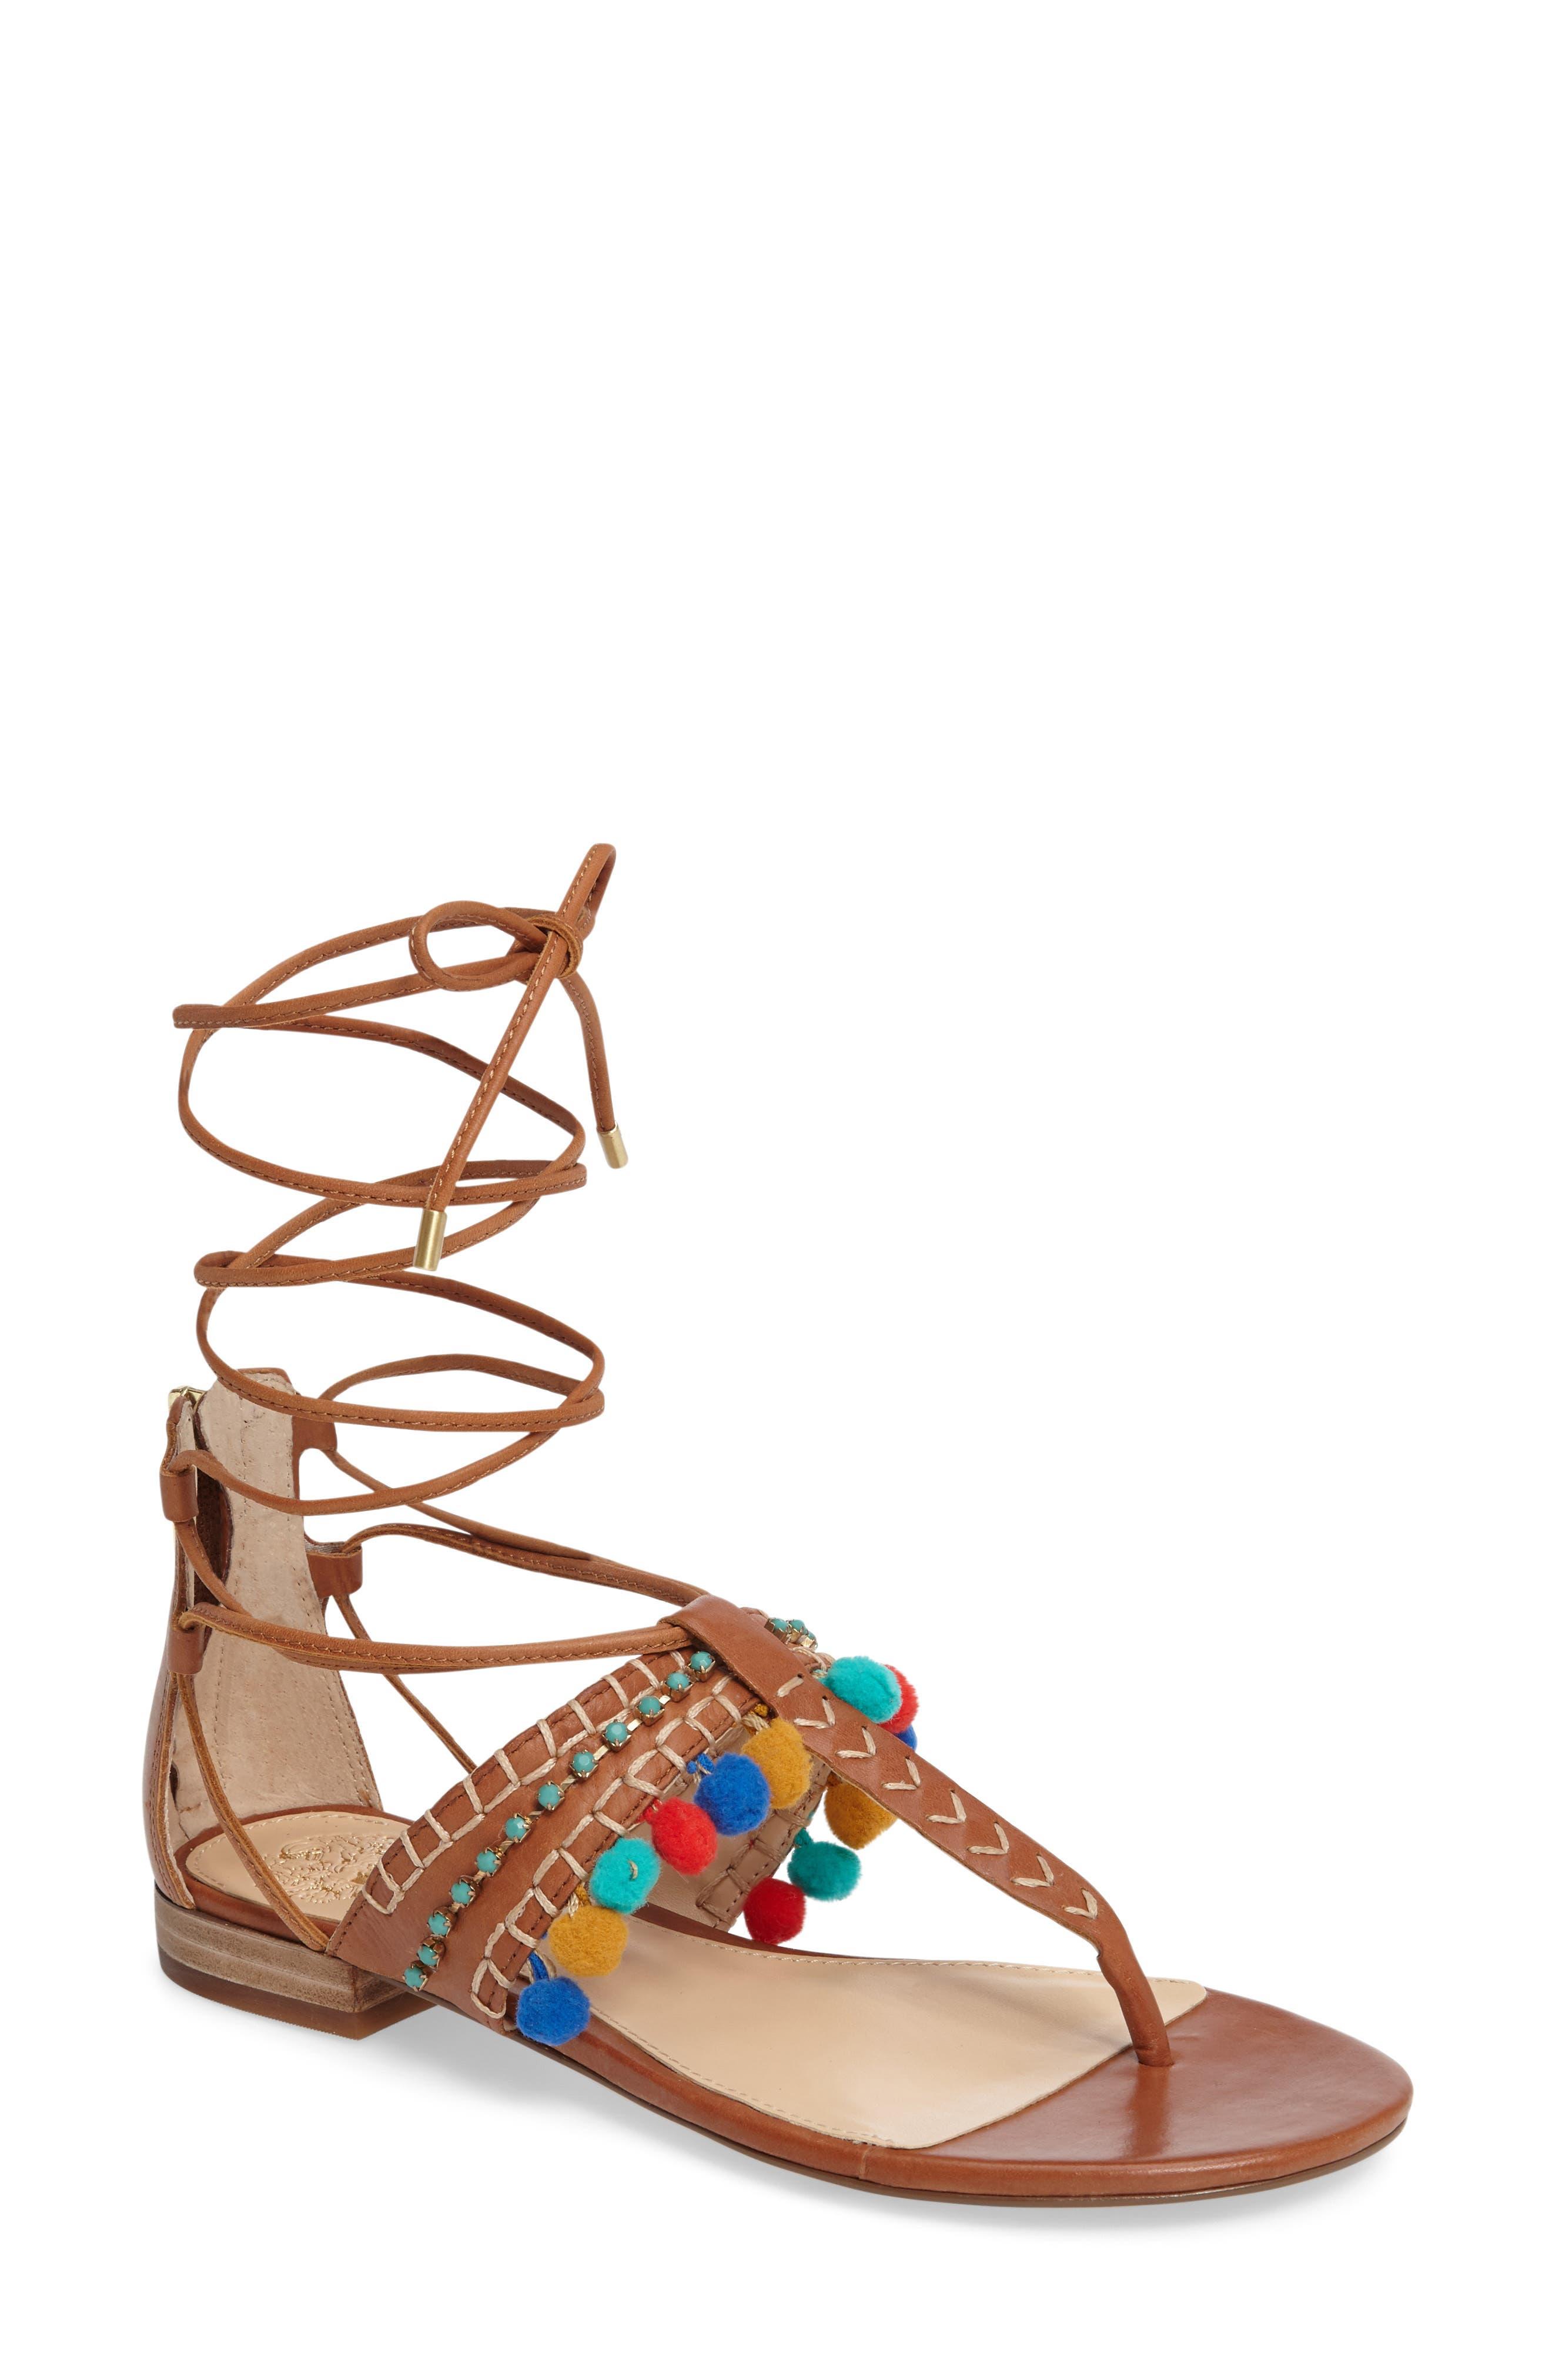 Main Image - Vince Camuto Balisa Embellished Lace-Up Sandal (Women)